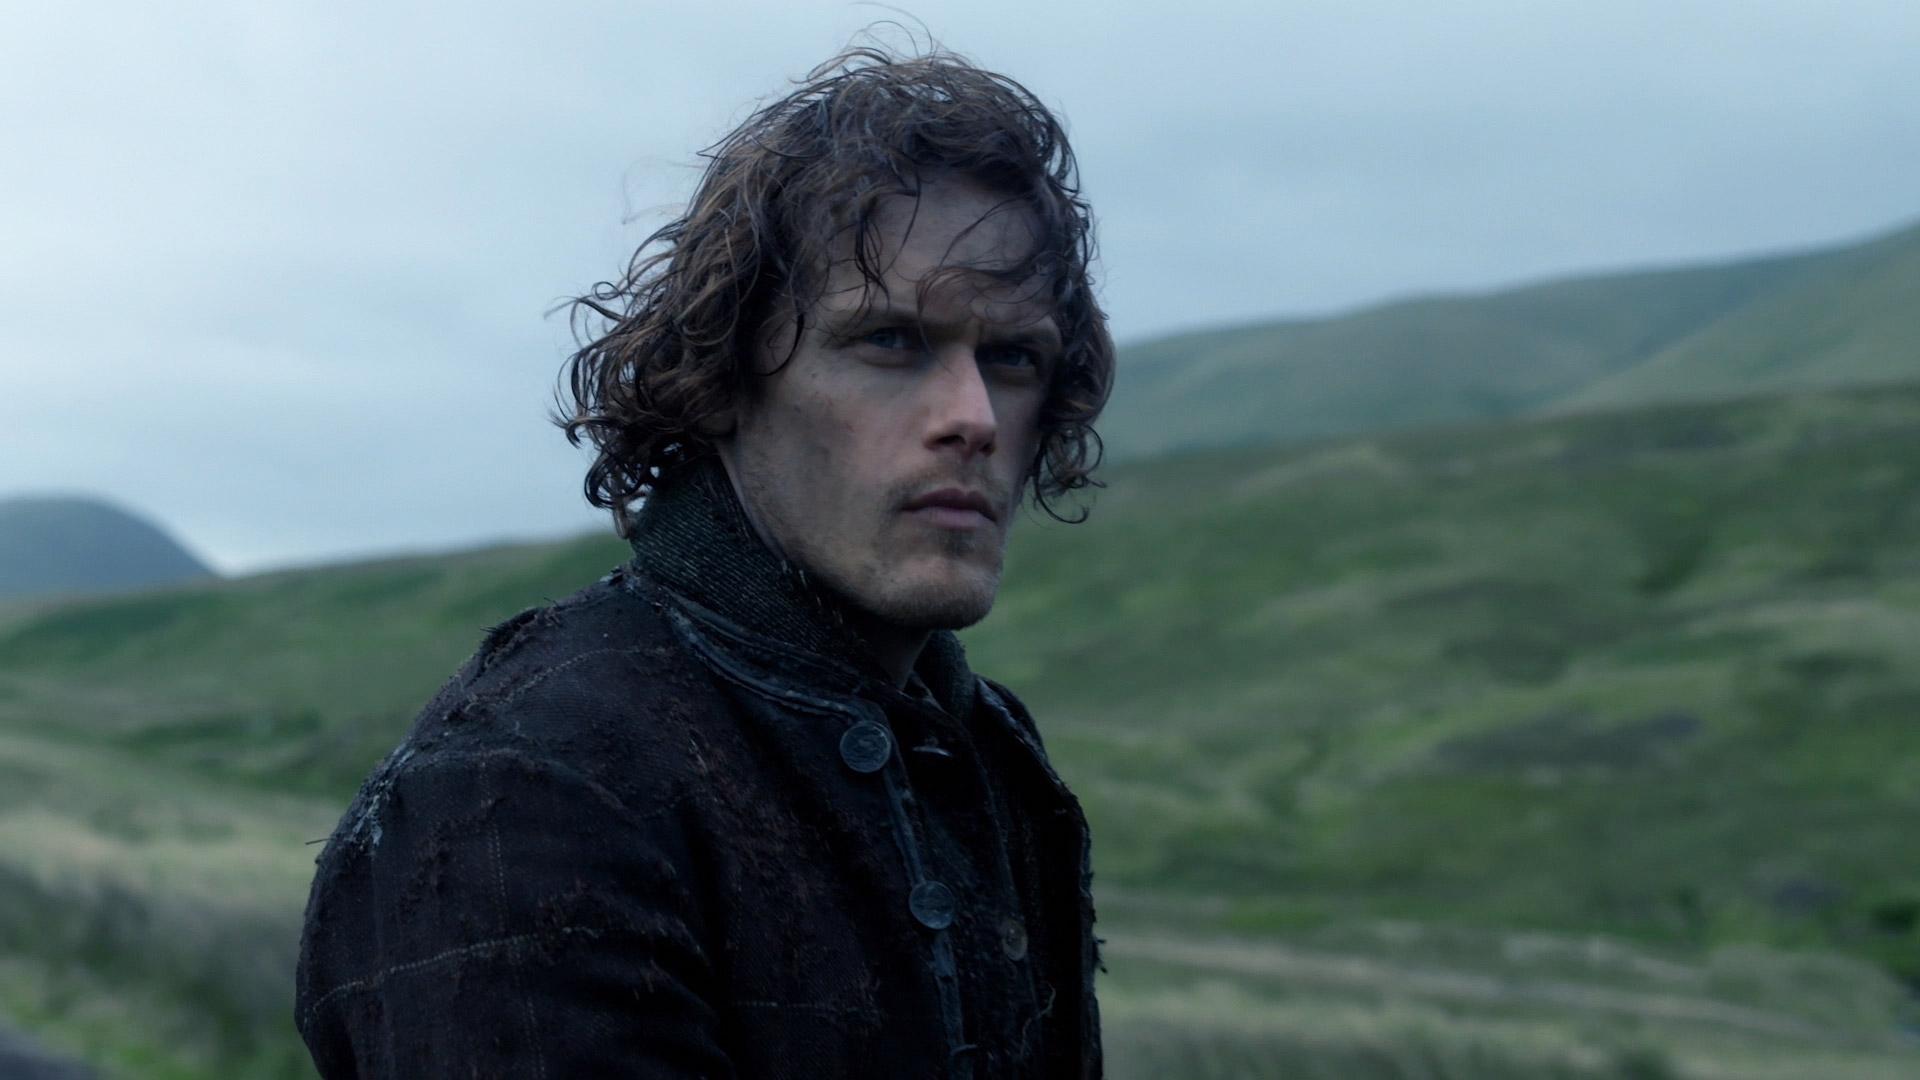 Outlander Star Sam Heughan On Why Fans Will Love Season 3!